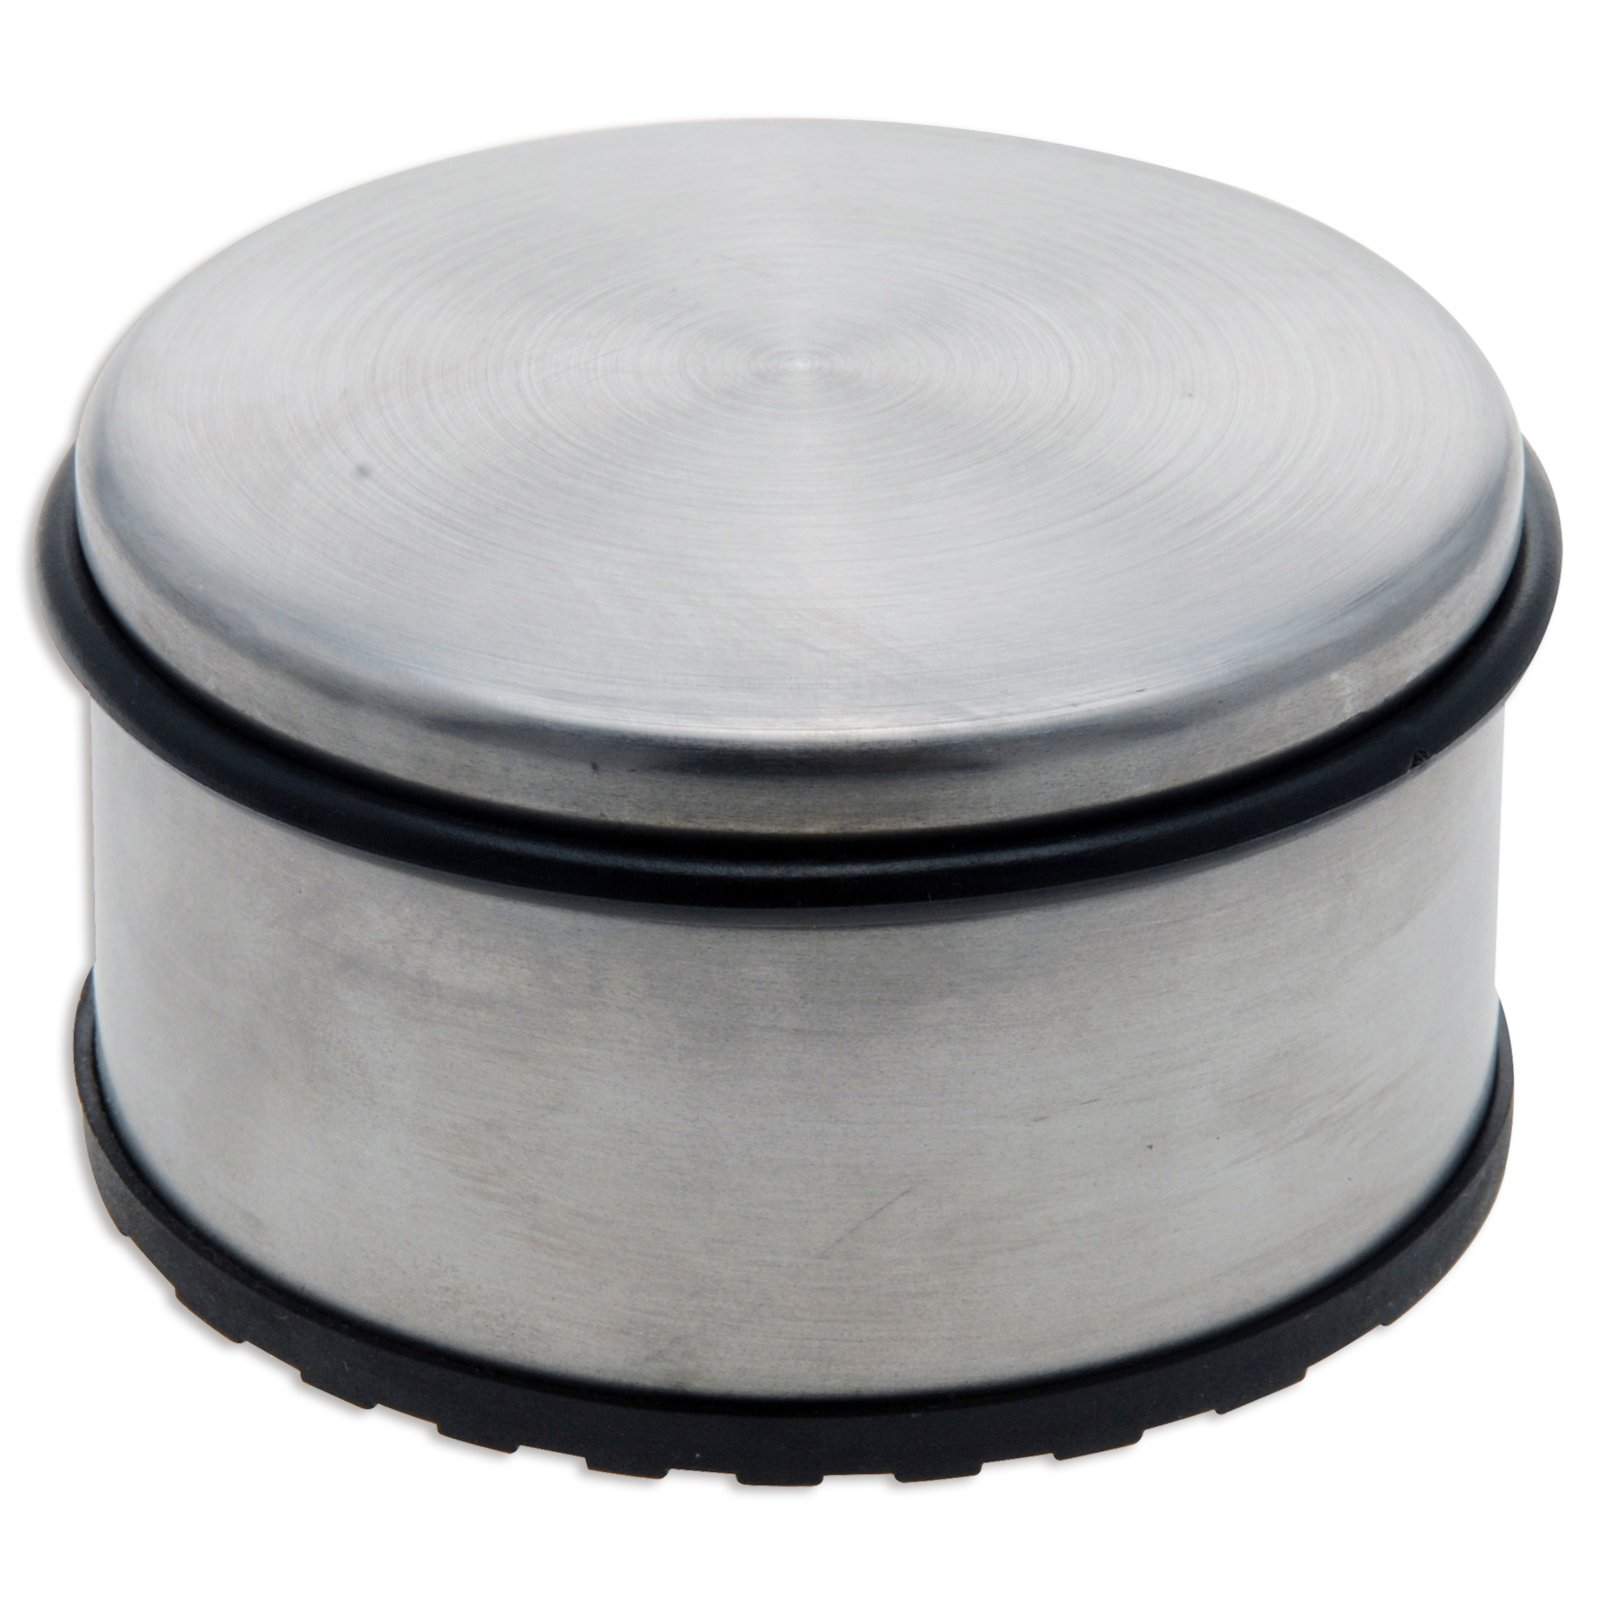 Türstopper - Edelstahl - 1,1 kg - Ø 11 cm